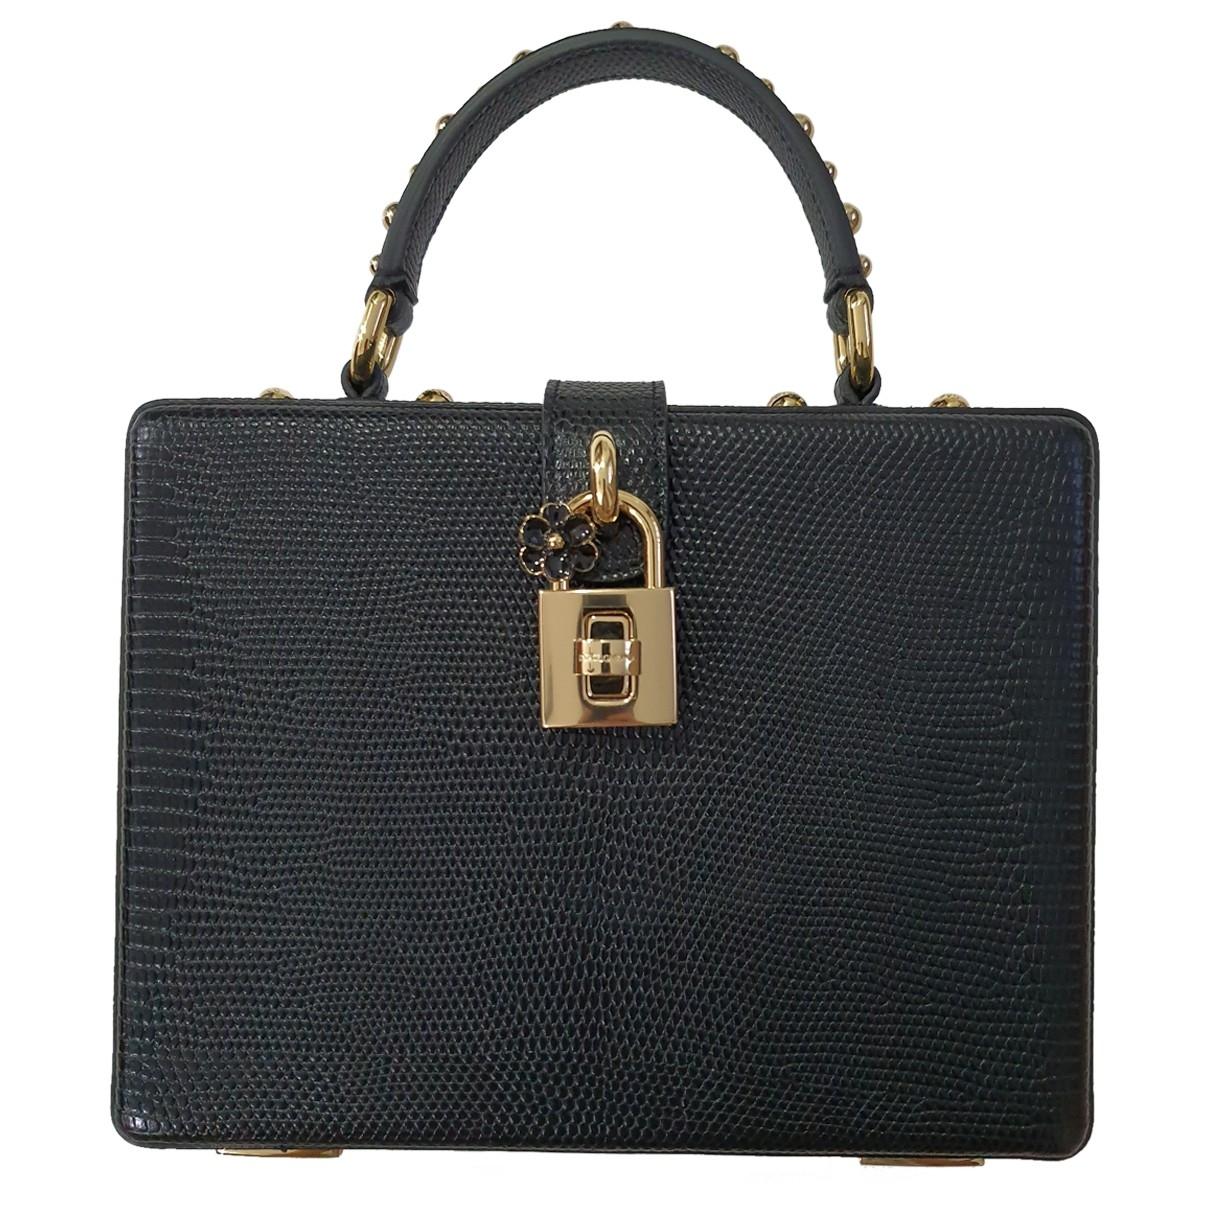 Dolce & Gabbana - Sac a main   pour femme en cuir - noir